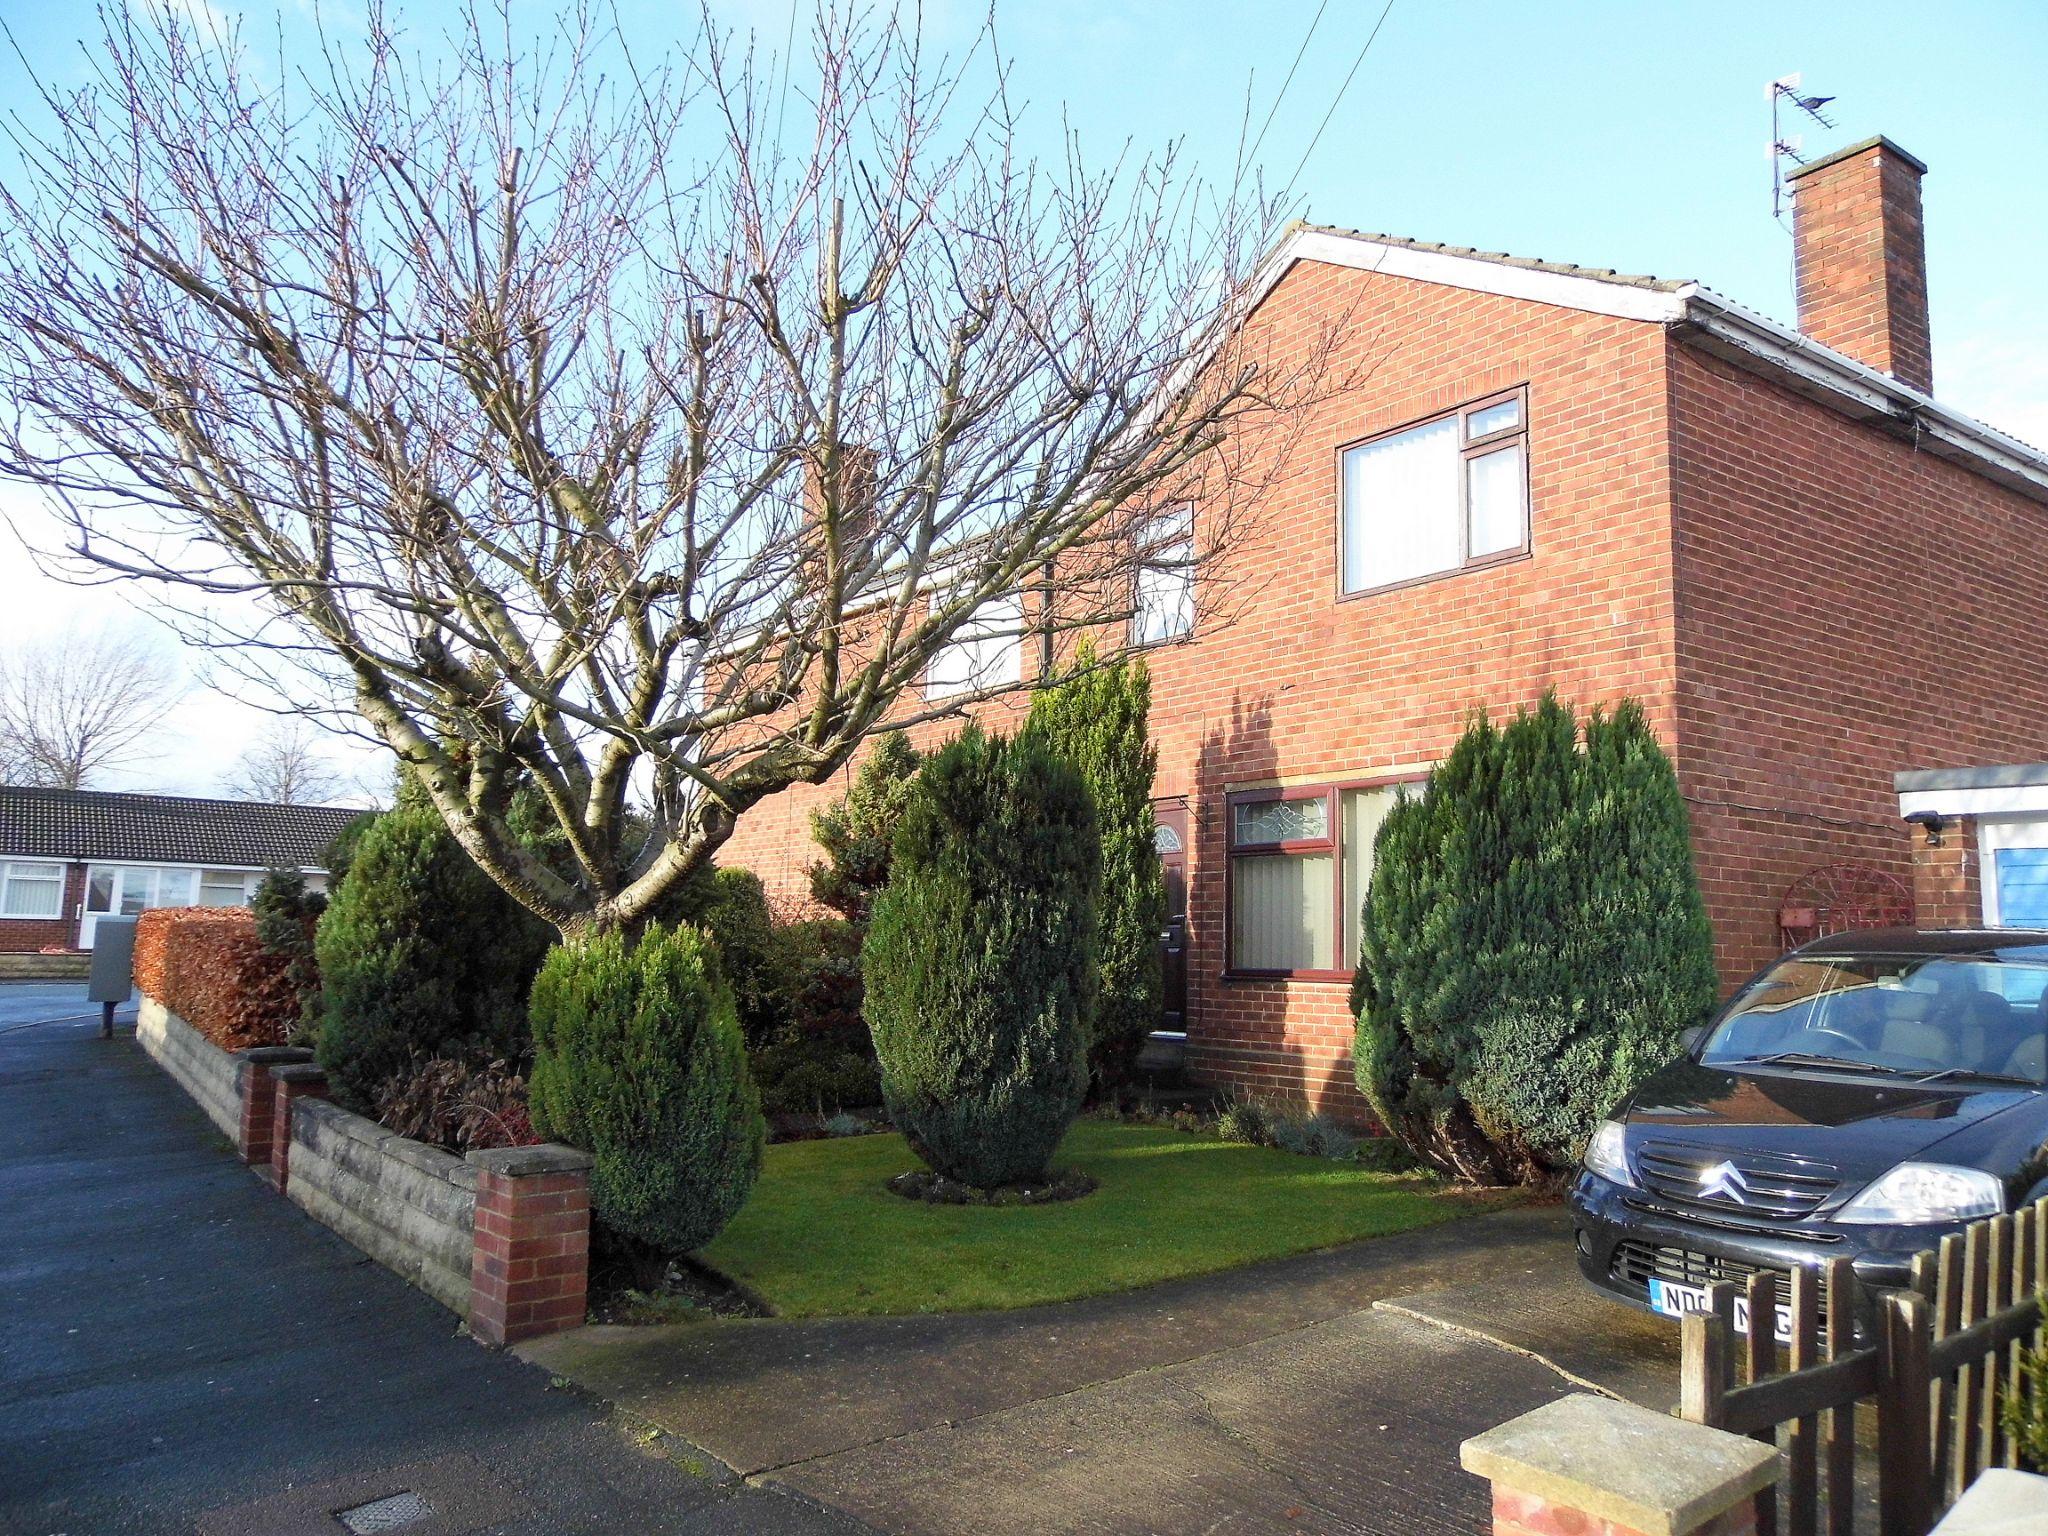 3 bedroom semi-detached house Sold in Bishop Auckland - Front Elevation.